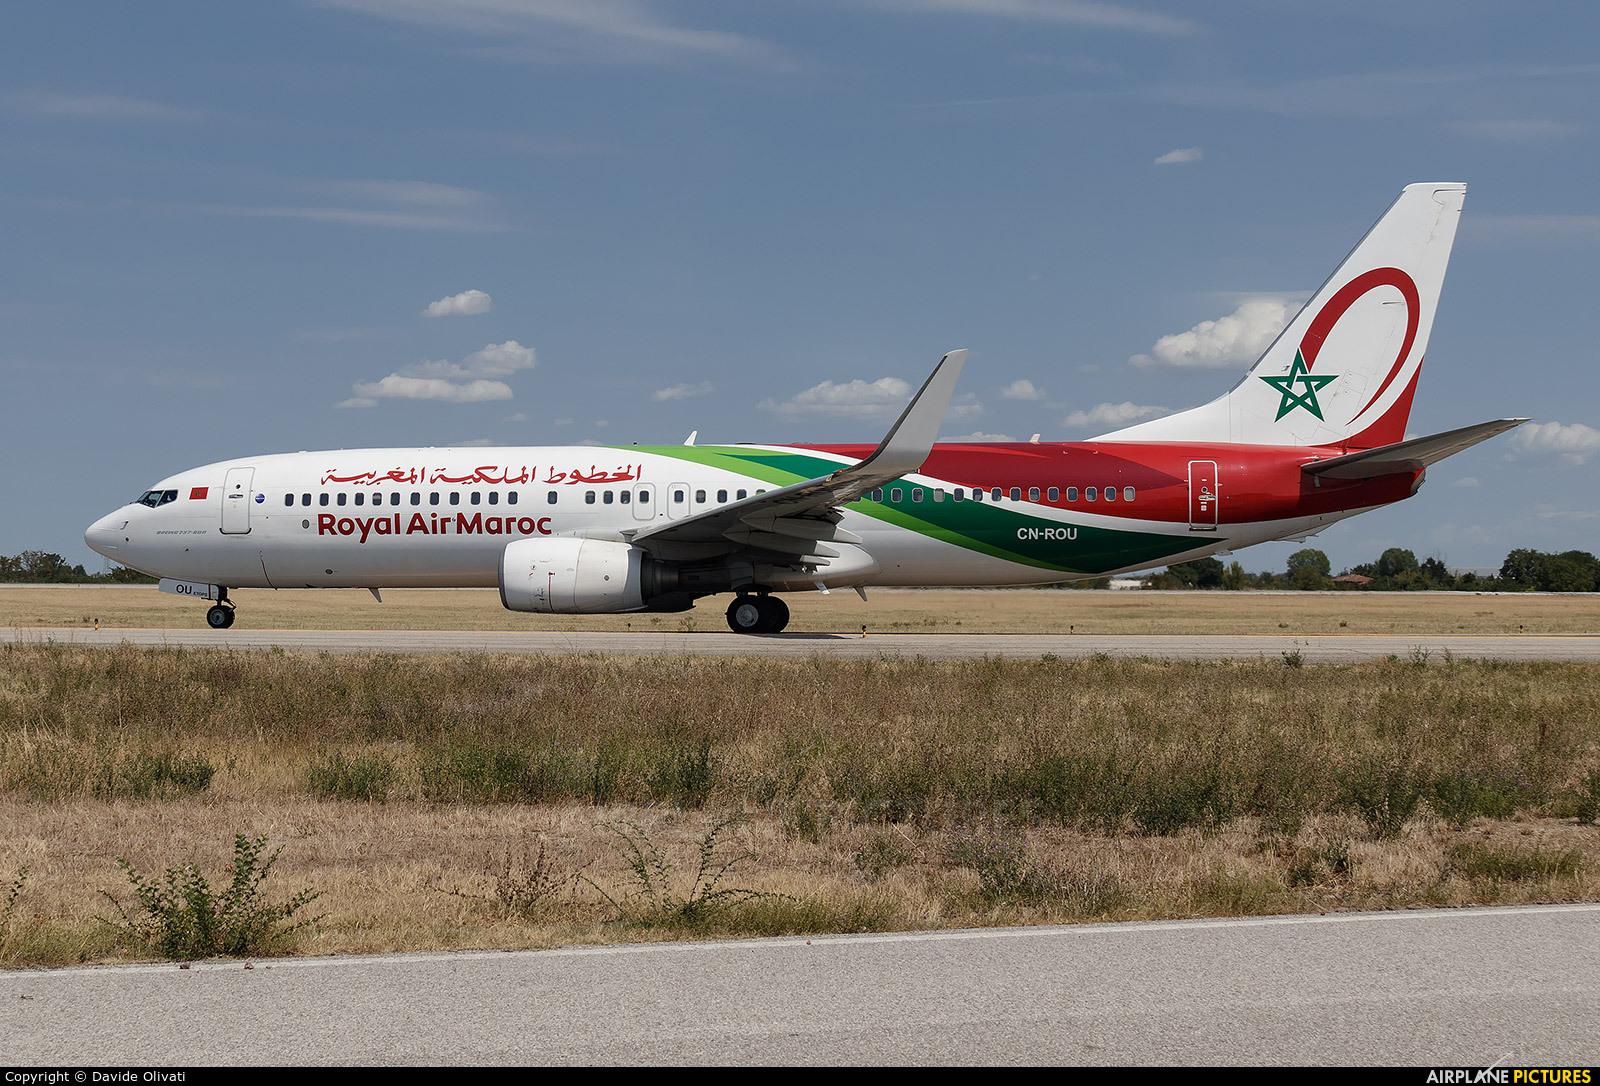 Royal Air Maroc CN-ROU aircraft at Bologna - Borgo Panigale